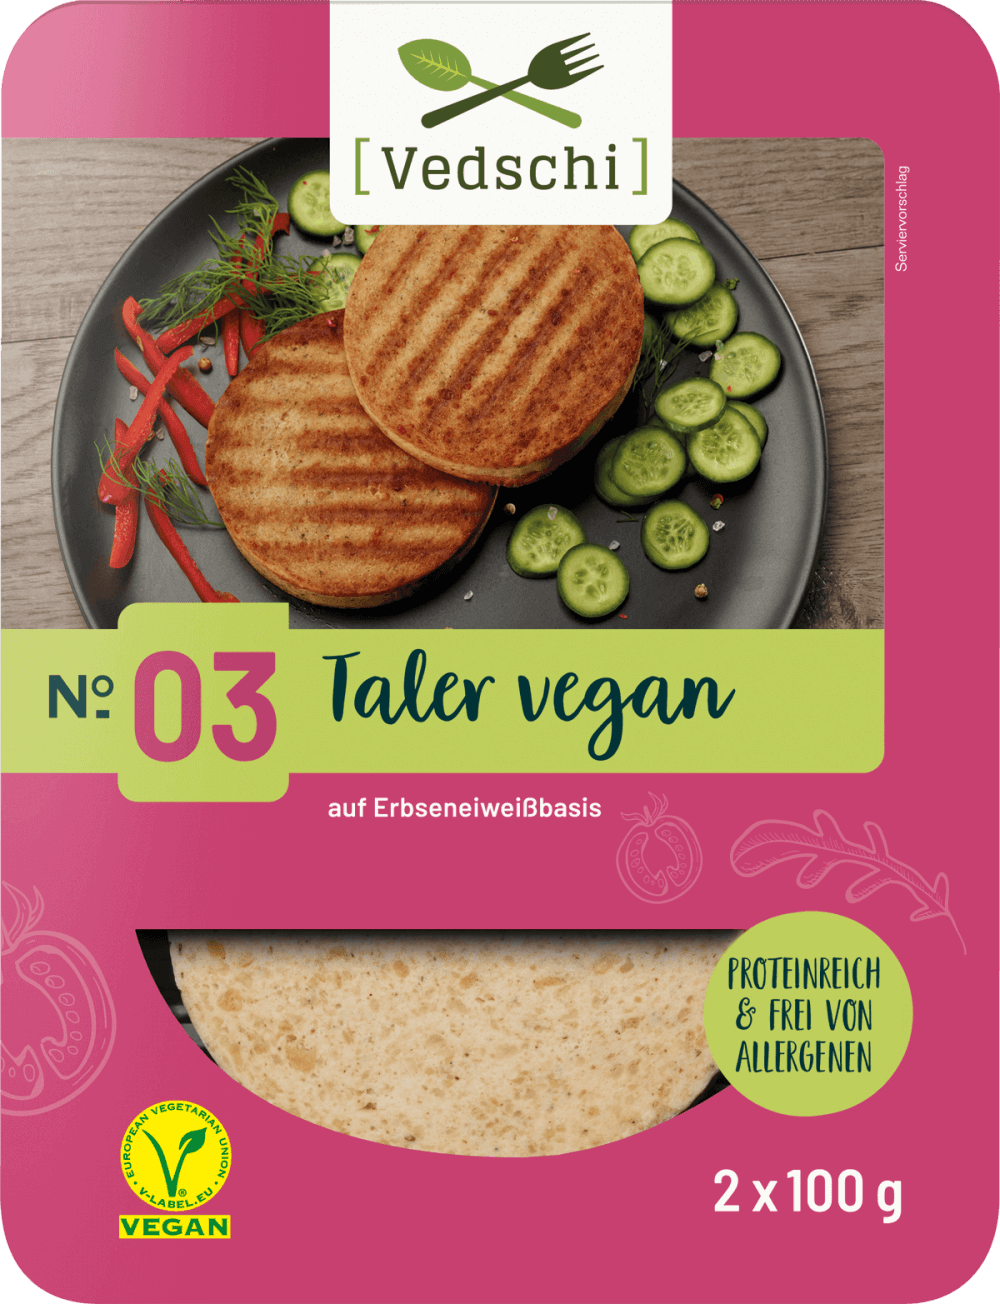 Vedschi № 03 Taler vegan im Verpackungsdesign